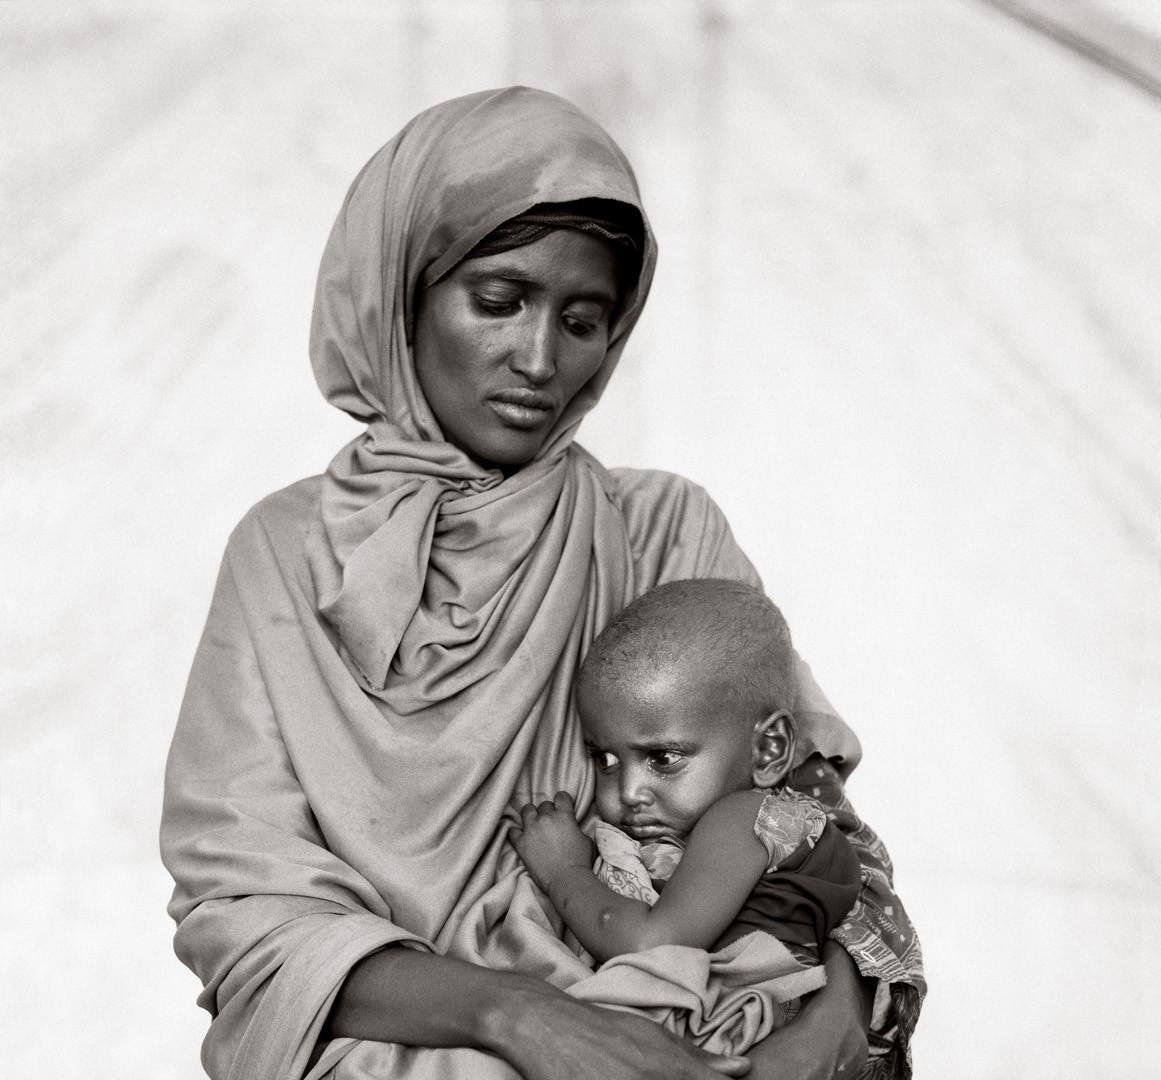 Fazal Sheikh, Amina Alio Abdi with her son Mohammed, Somali refugee camp, Mandera, Kenya, 1993